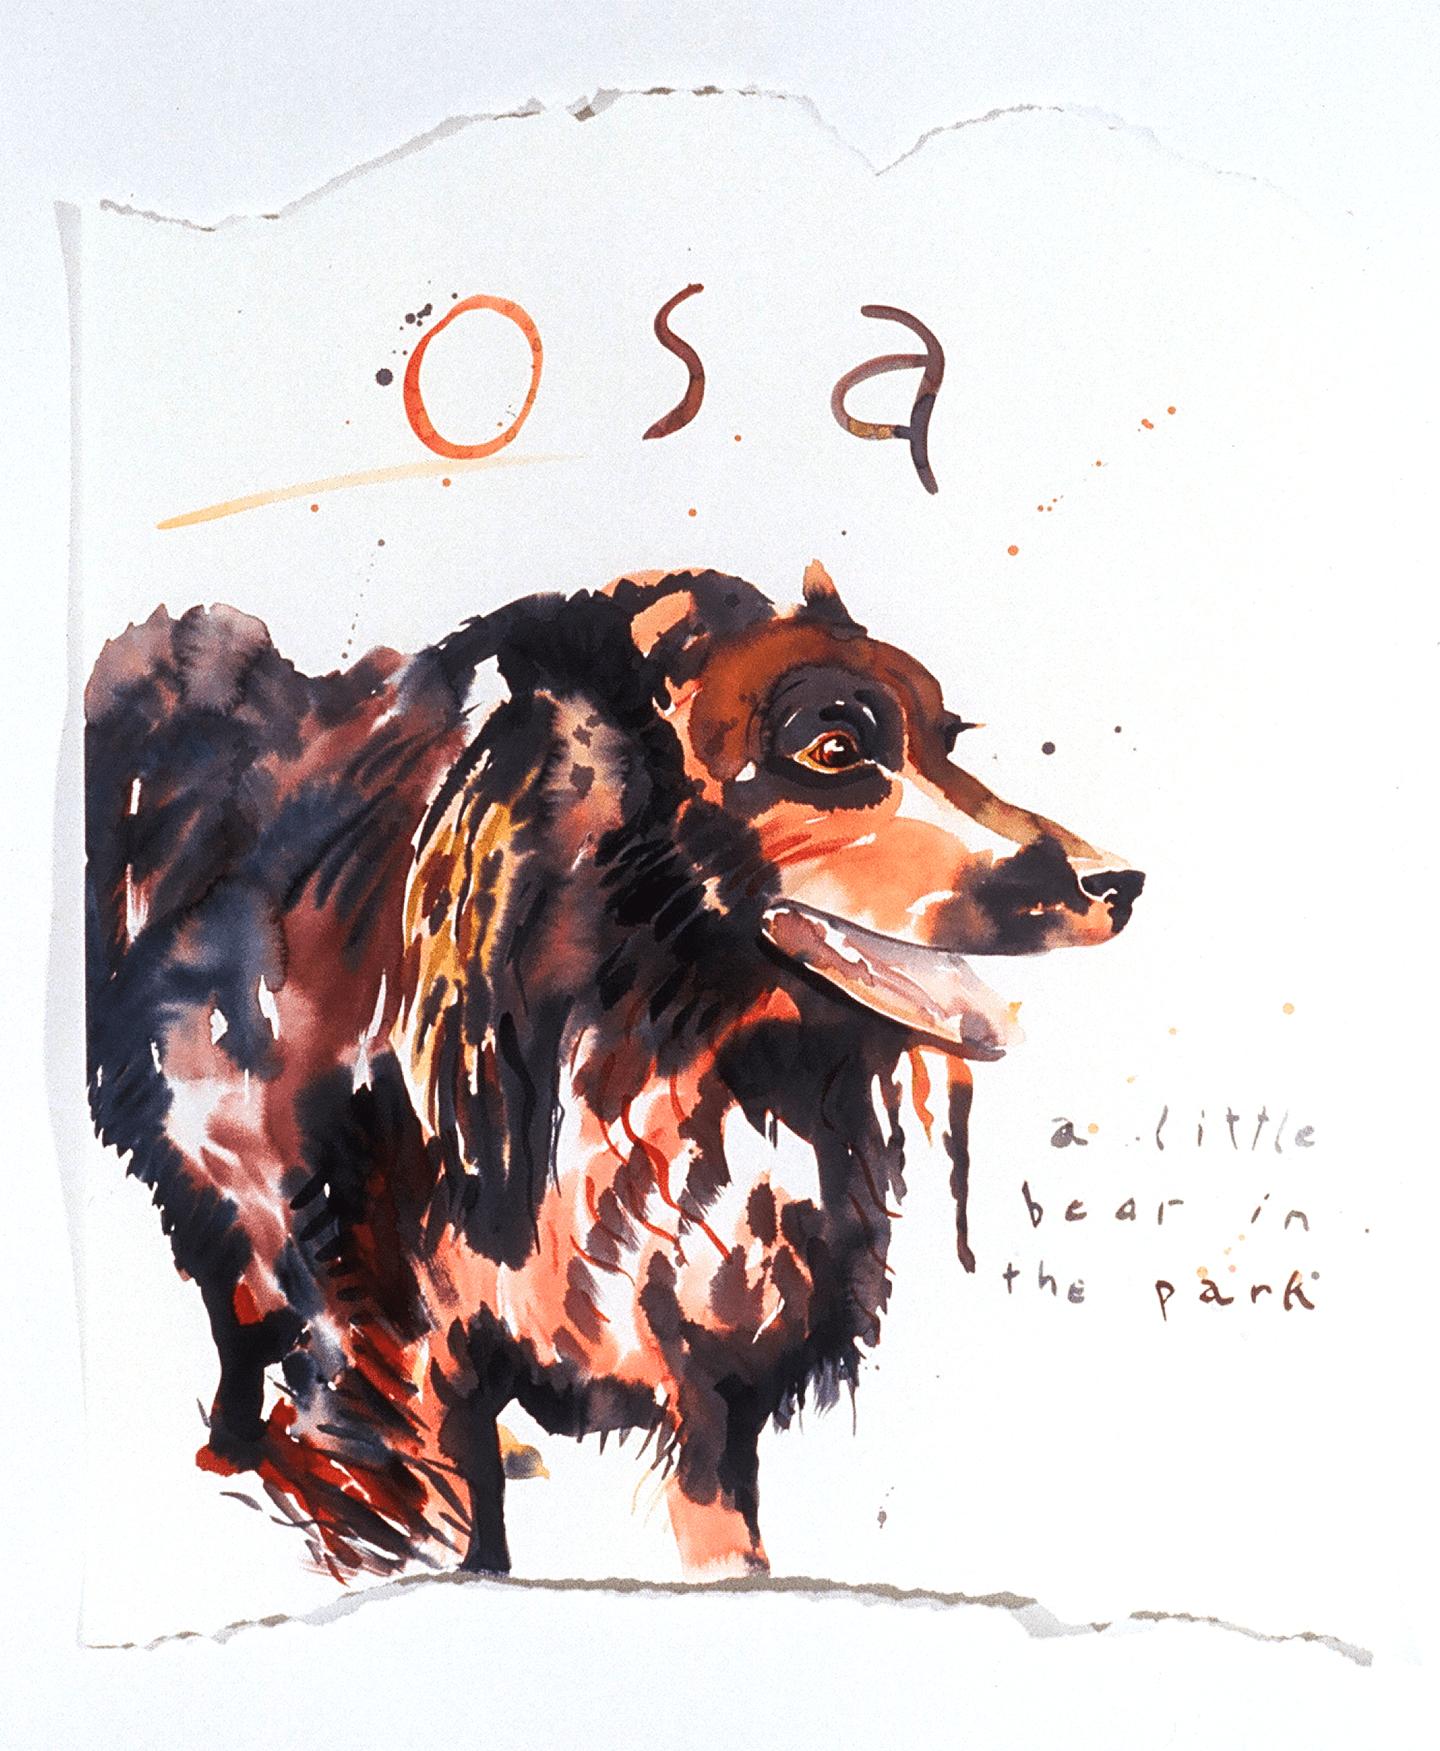 Osa, the little bear from the park in Santa Fe.